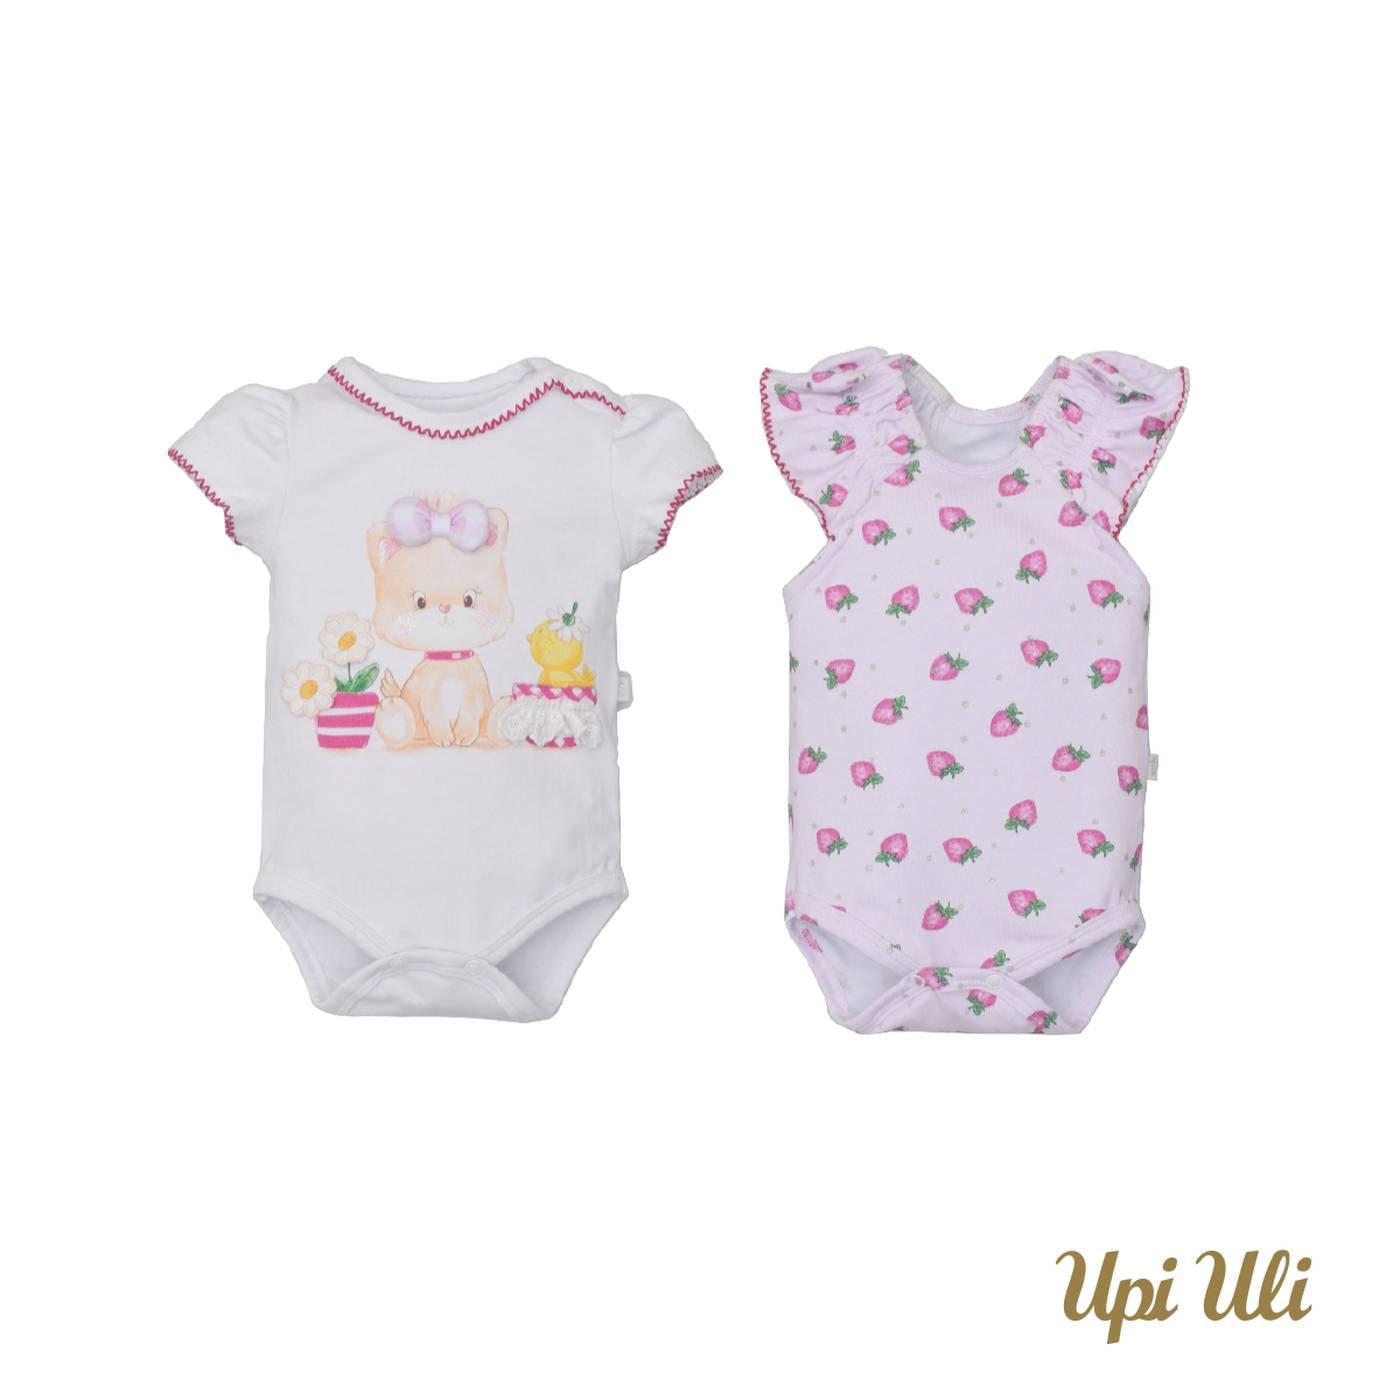 Kit bebê body 2 Peças Cotton Valeria